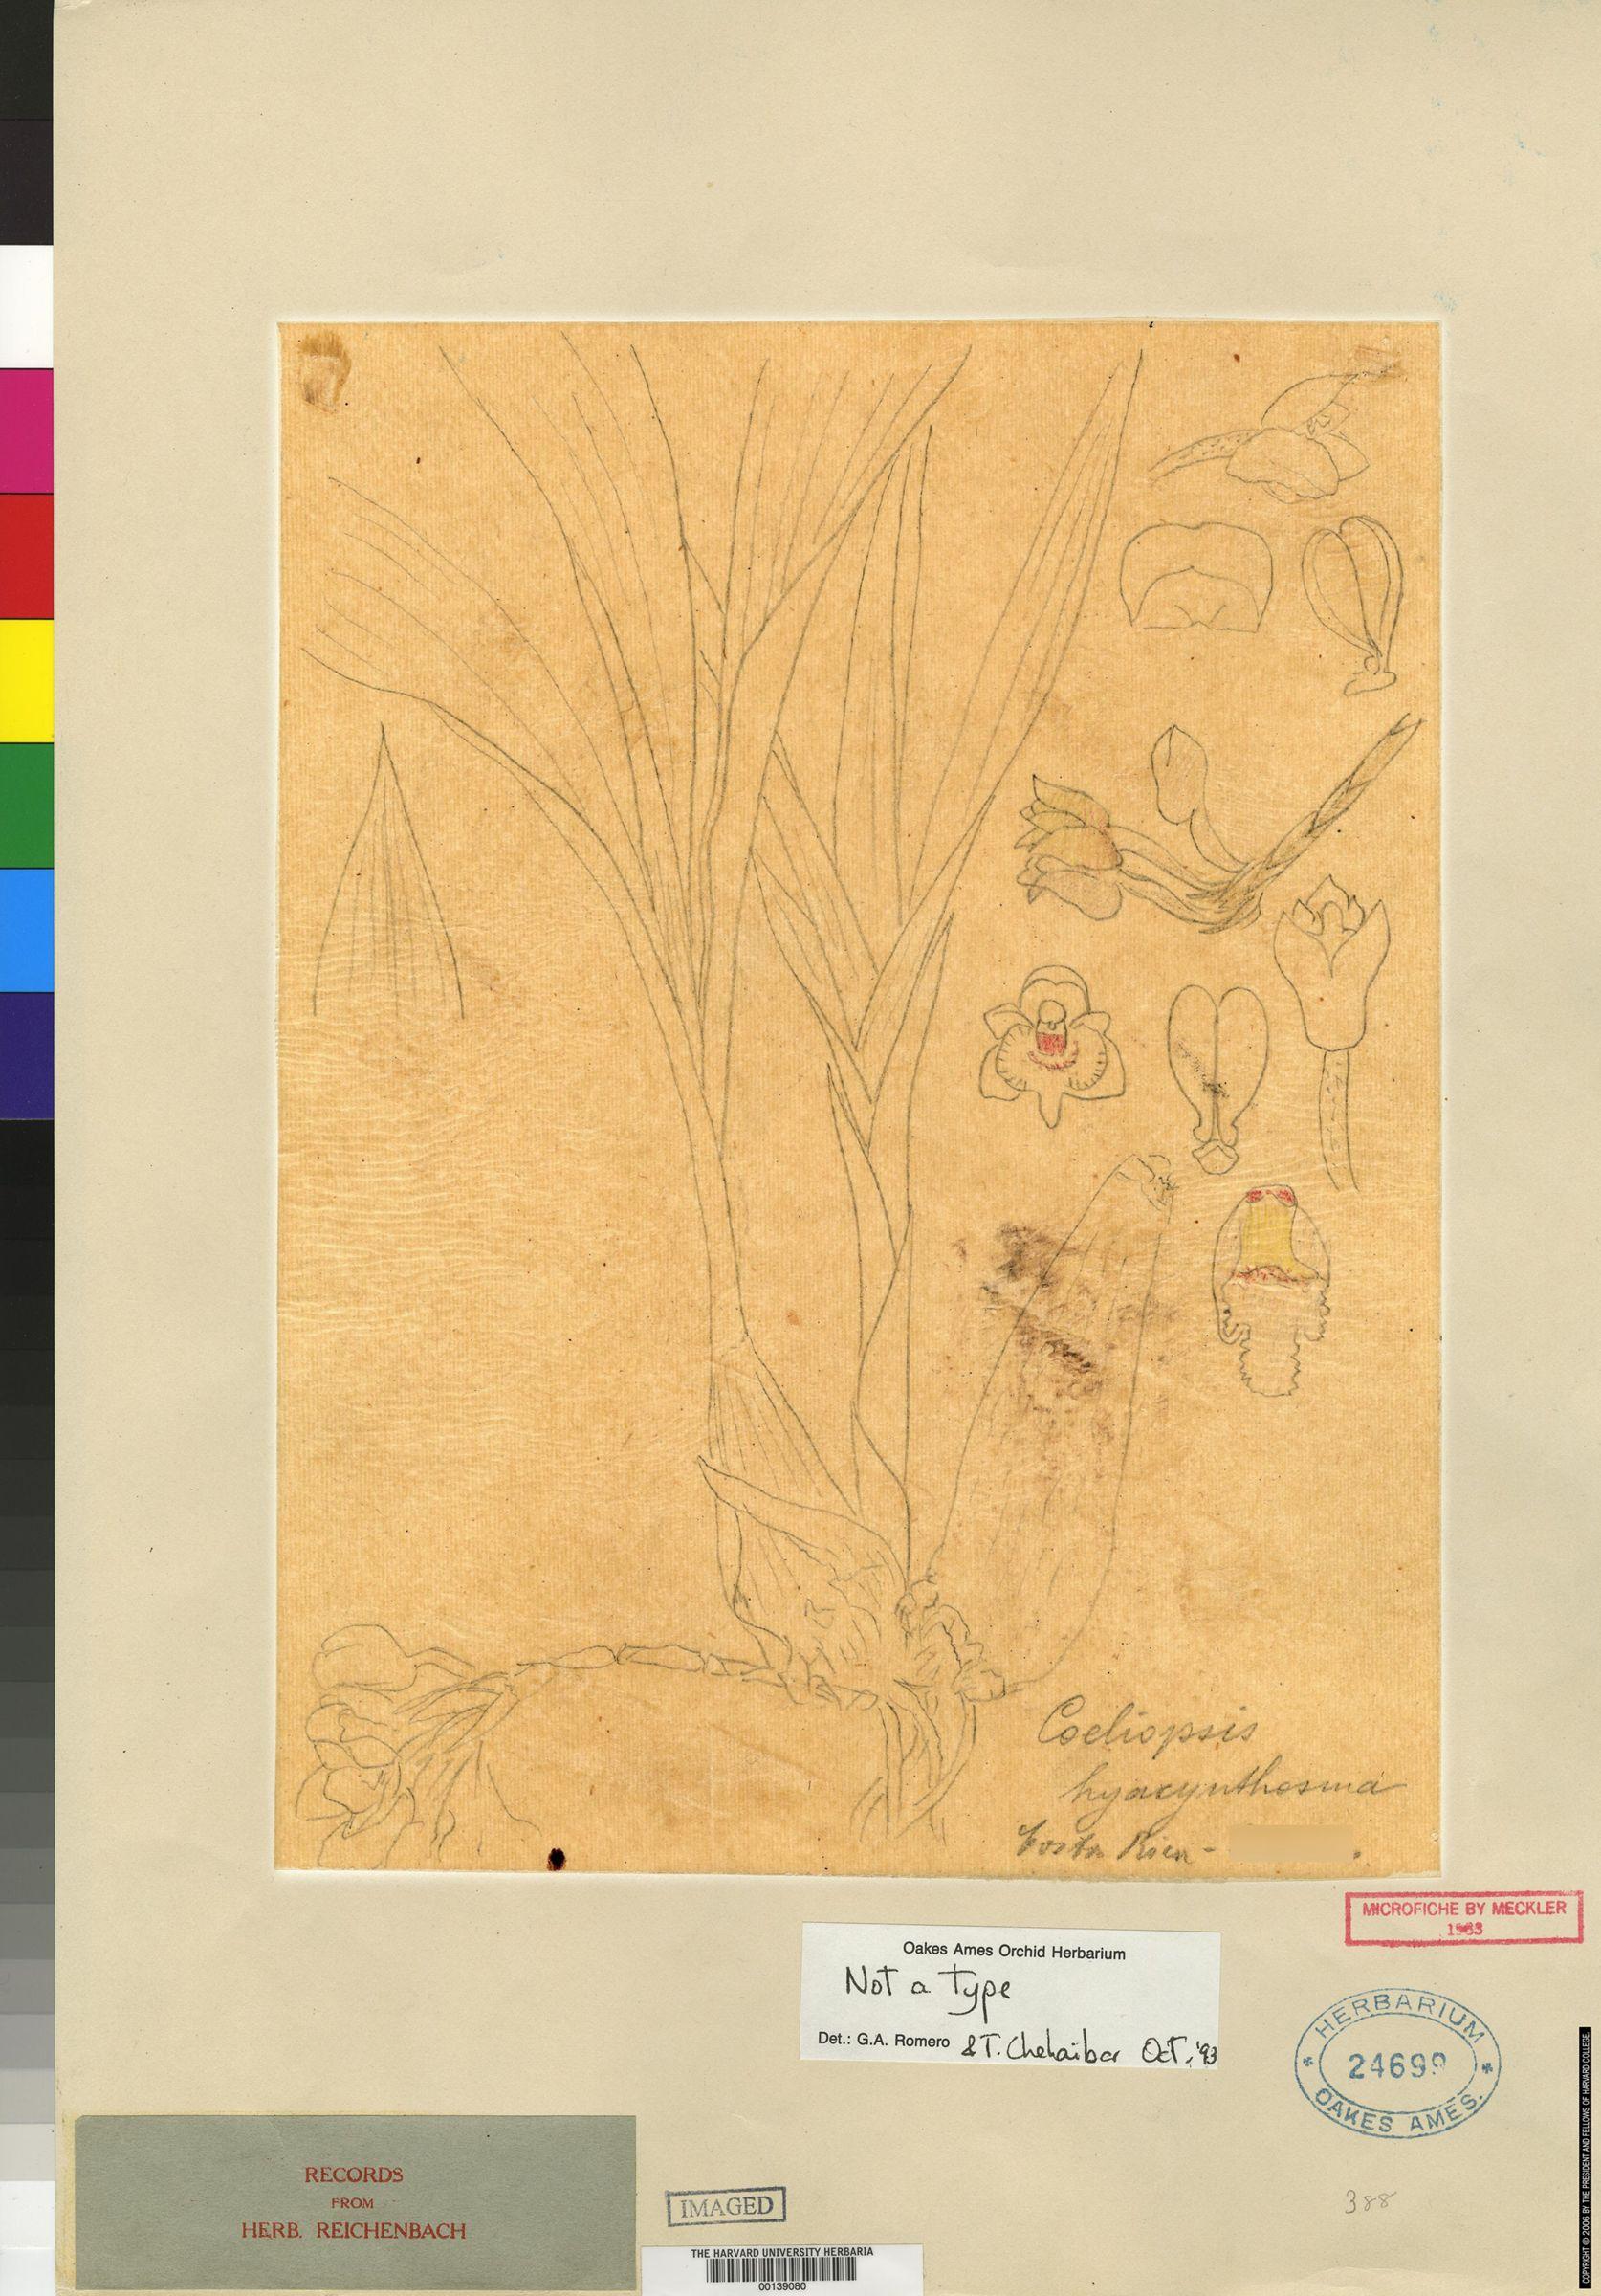 Coeliopsis hyacinthosma image